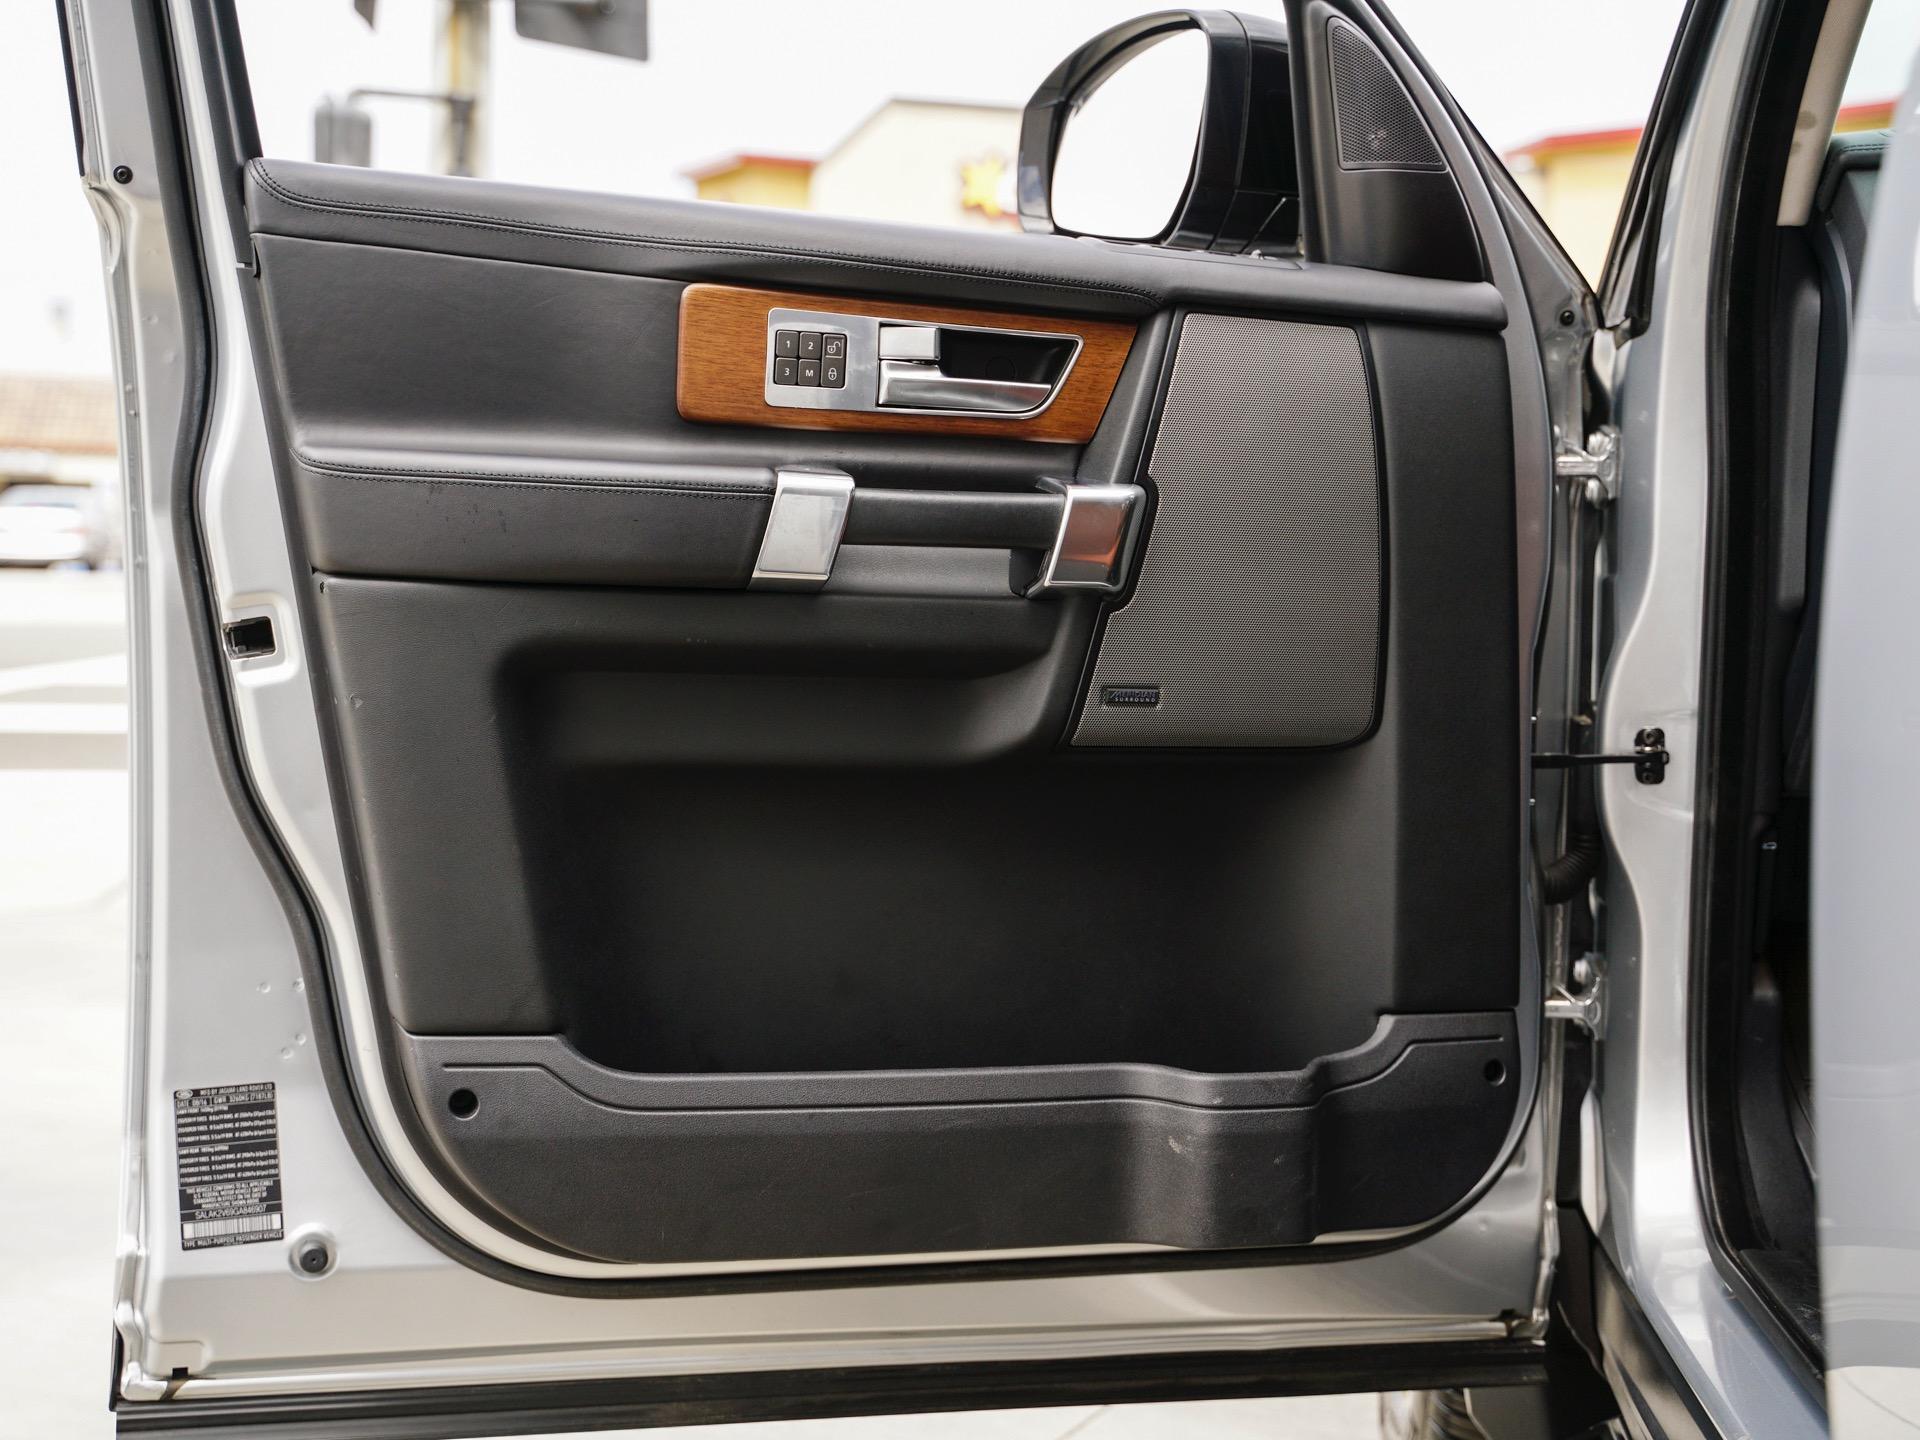 Used-2016-Land-Rover-LR4-Landmark-Edition